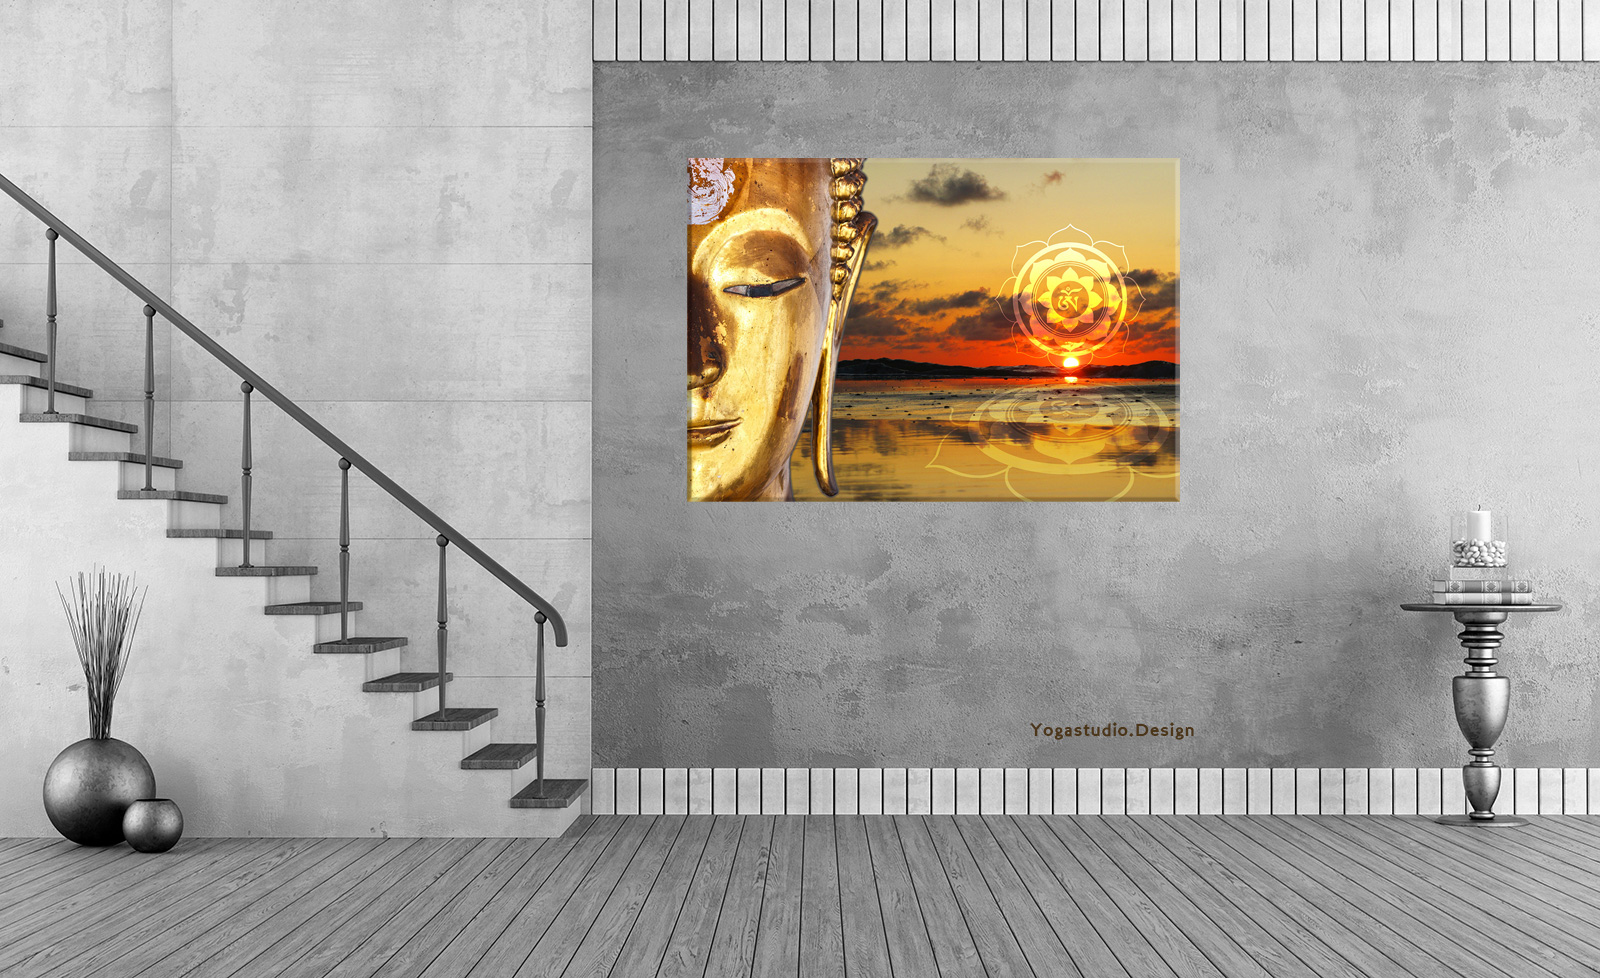 Fotomotiv Golden Buddha Wanddeko